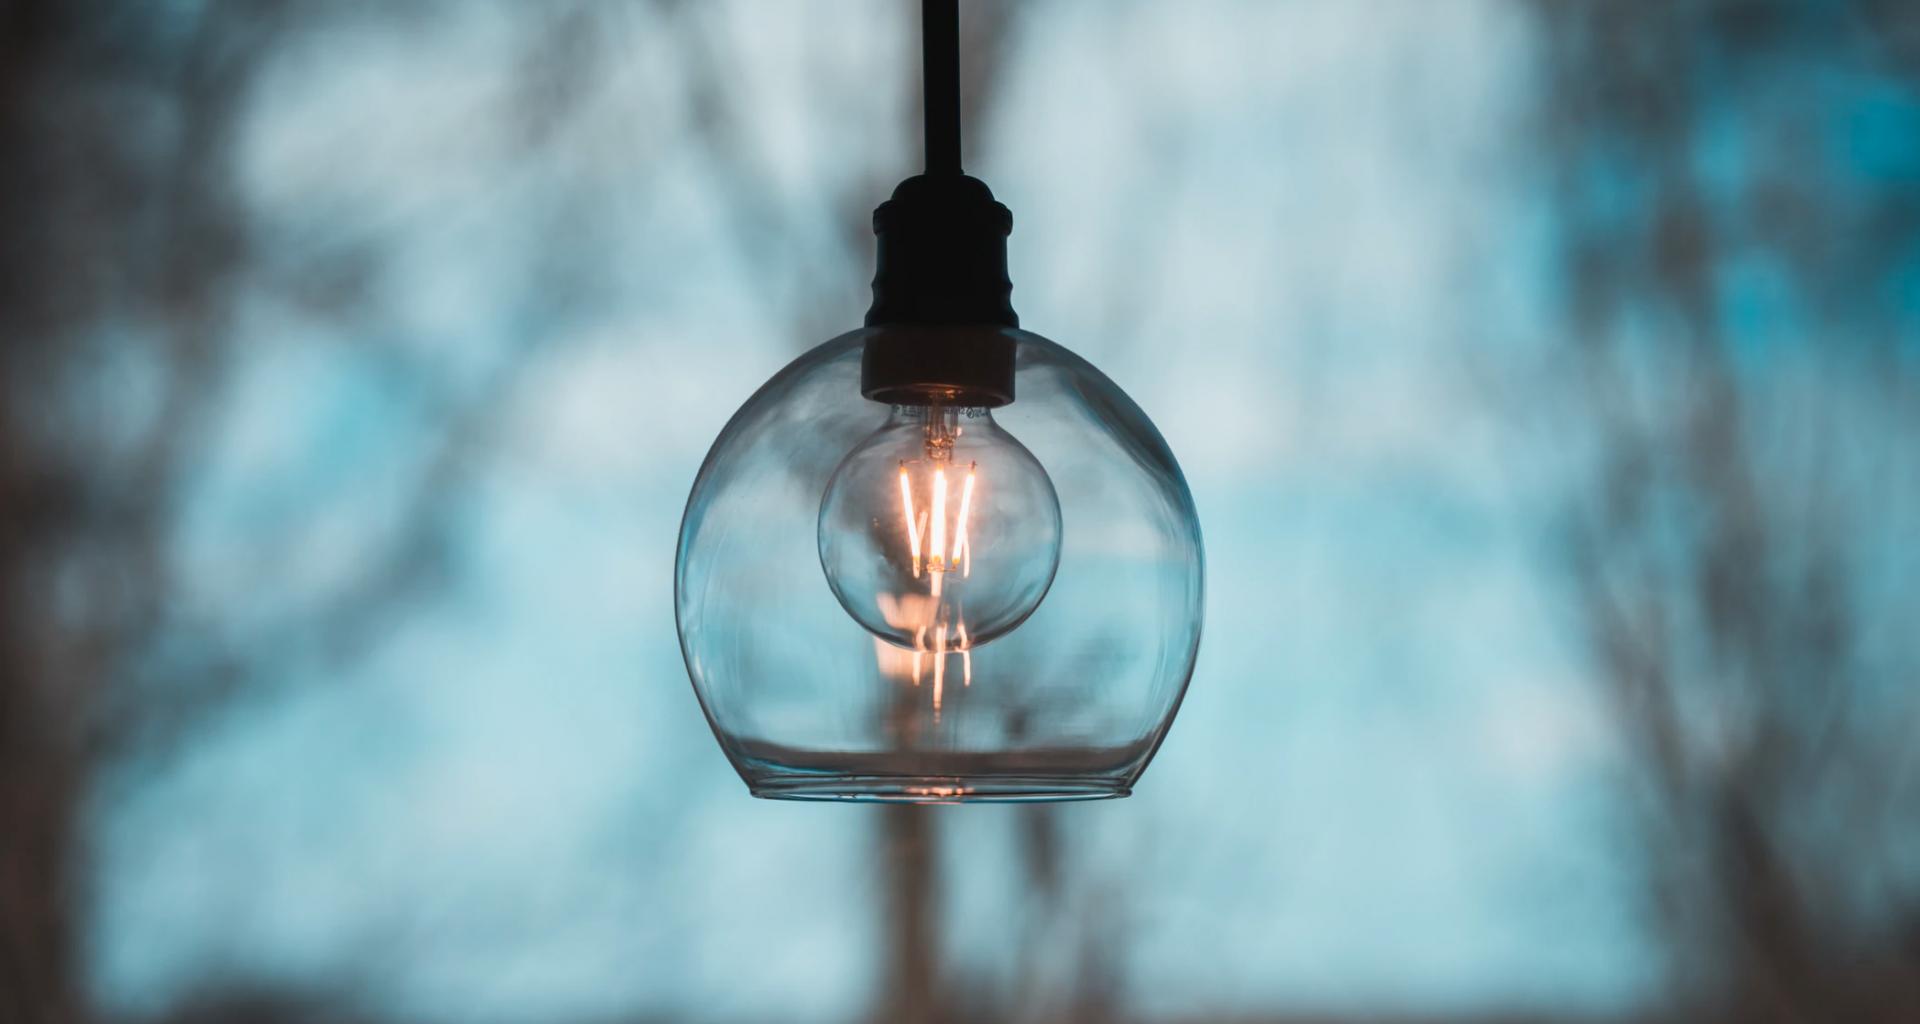 Lámpara encendida